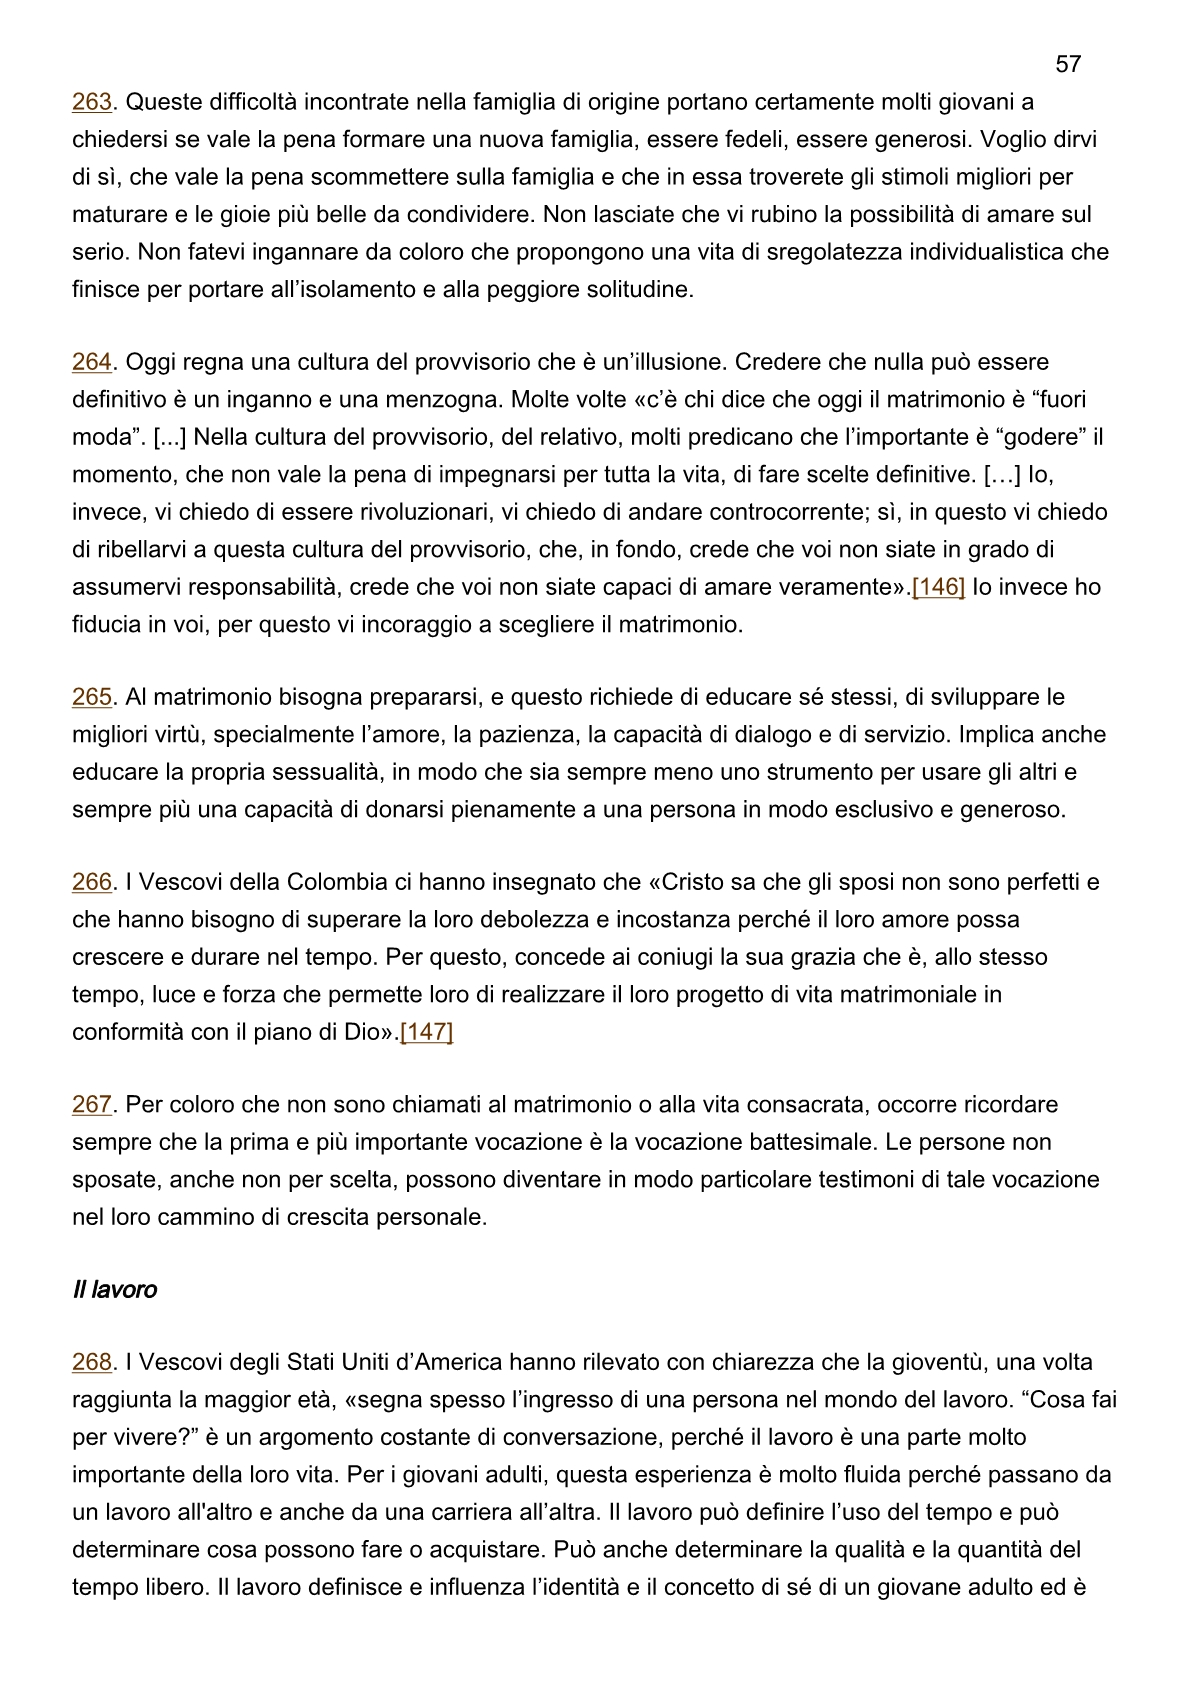 papa-francesco_esortazione-ap_20190325_christus-vivit57